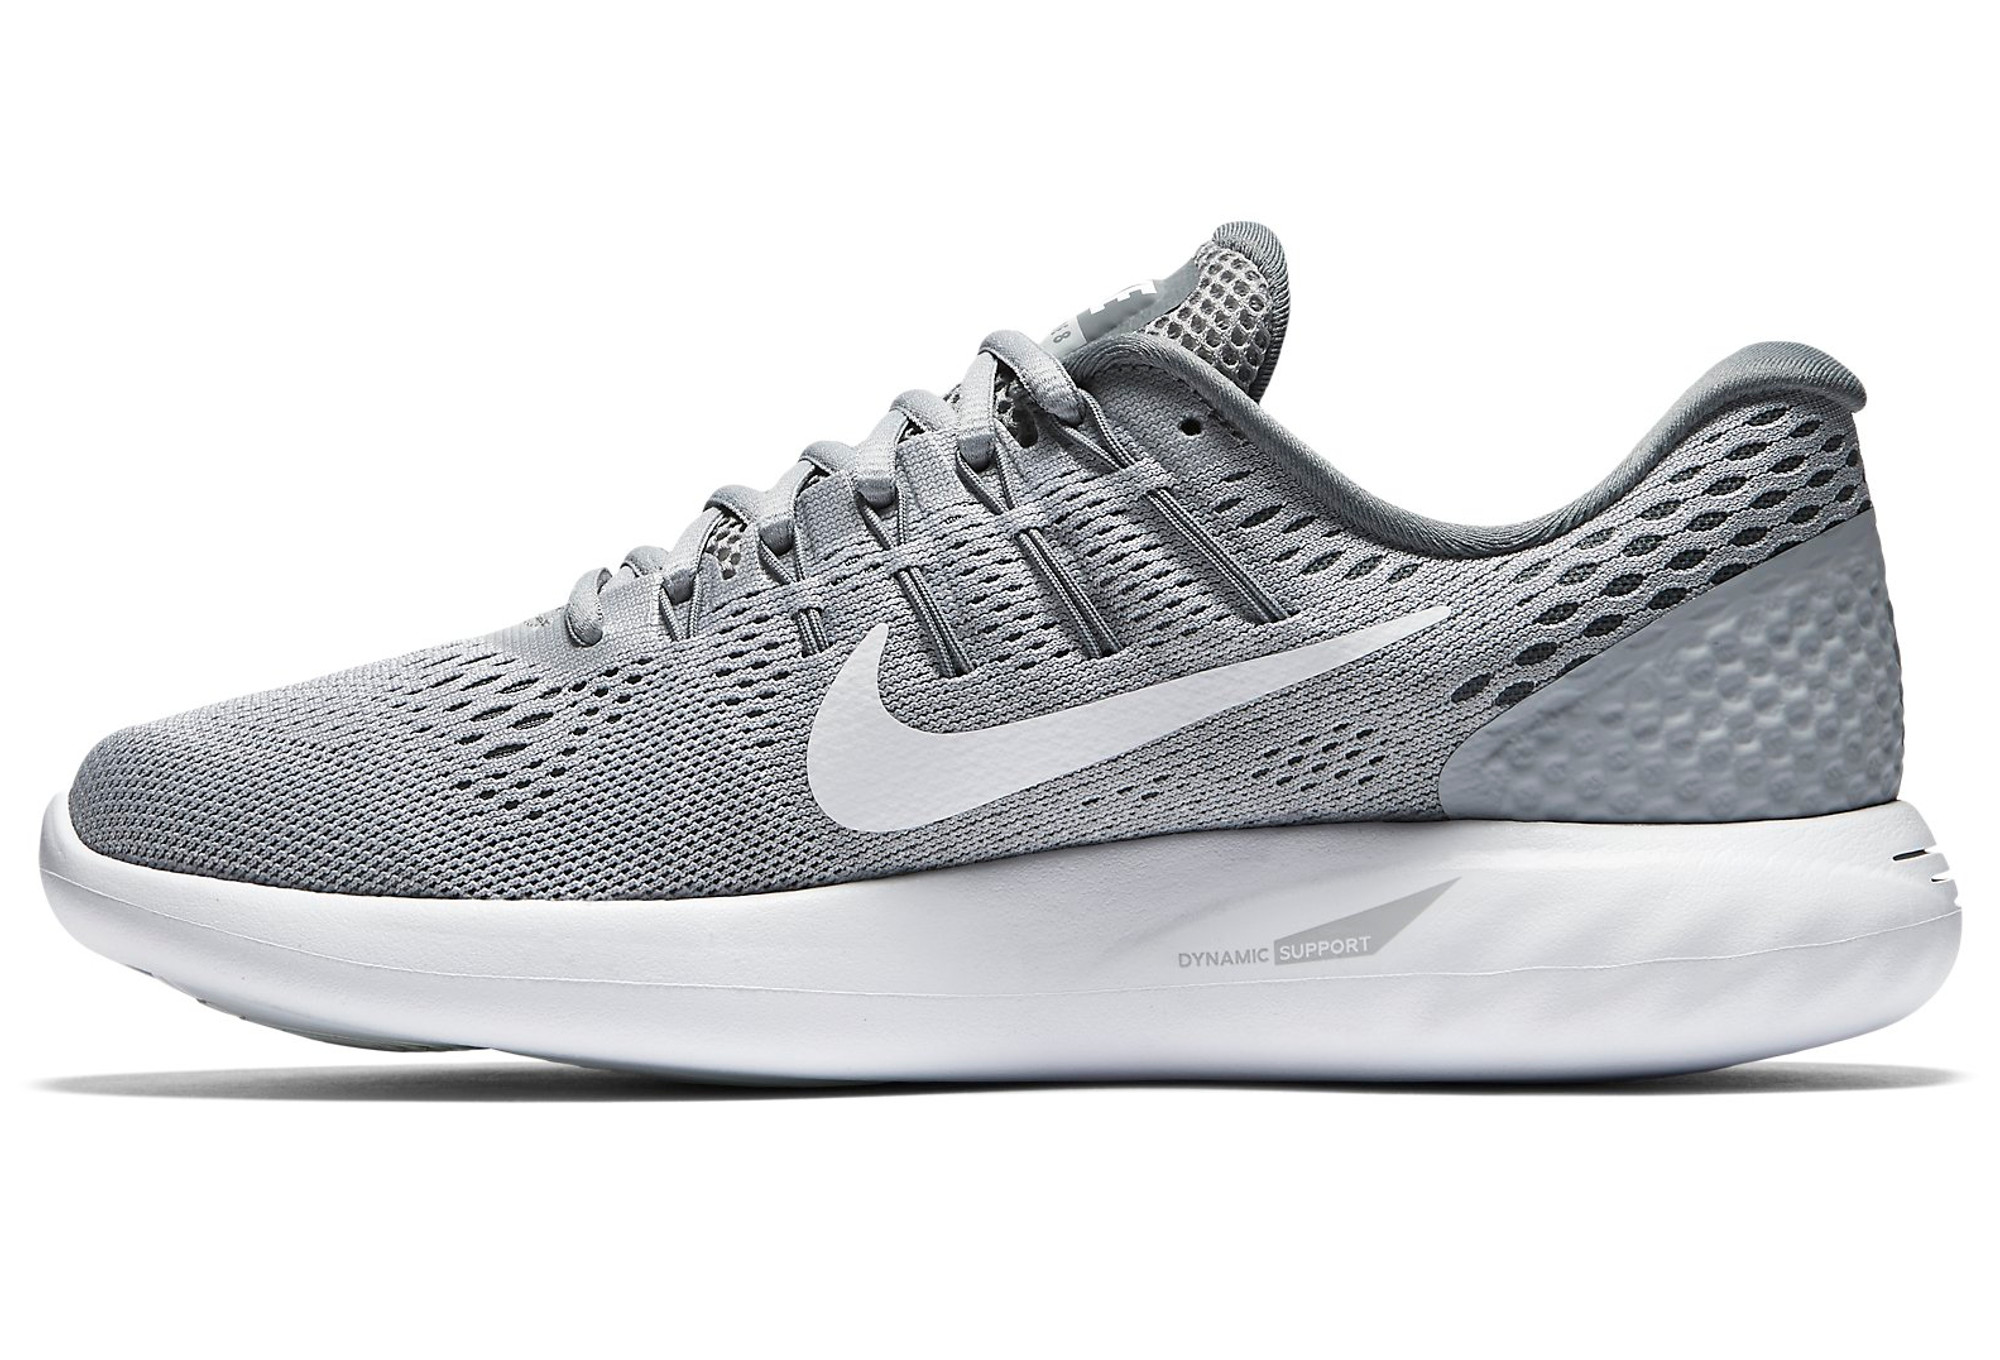 Nike LunarGlide 8 Schuhe Grau Frauen